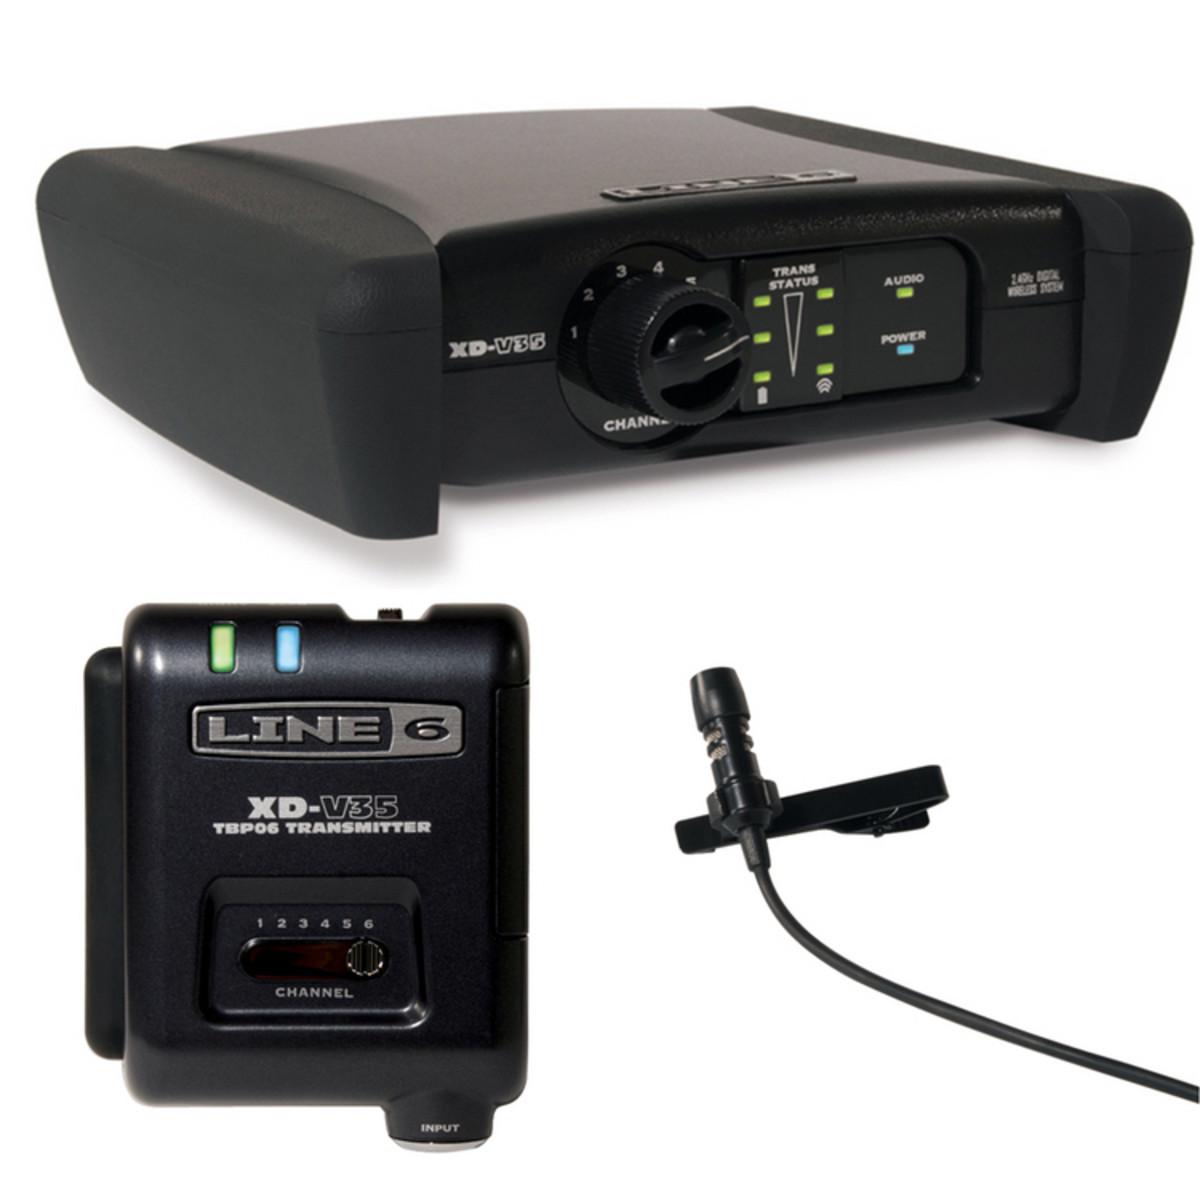 Image of Line 6 XD-V35 Digital Wireless Lavalier Mic System